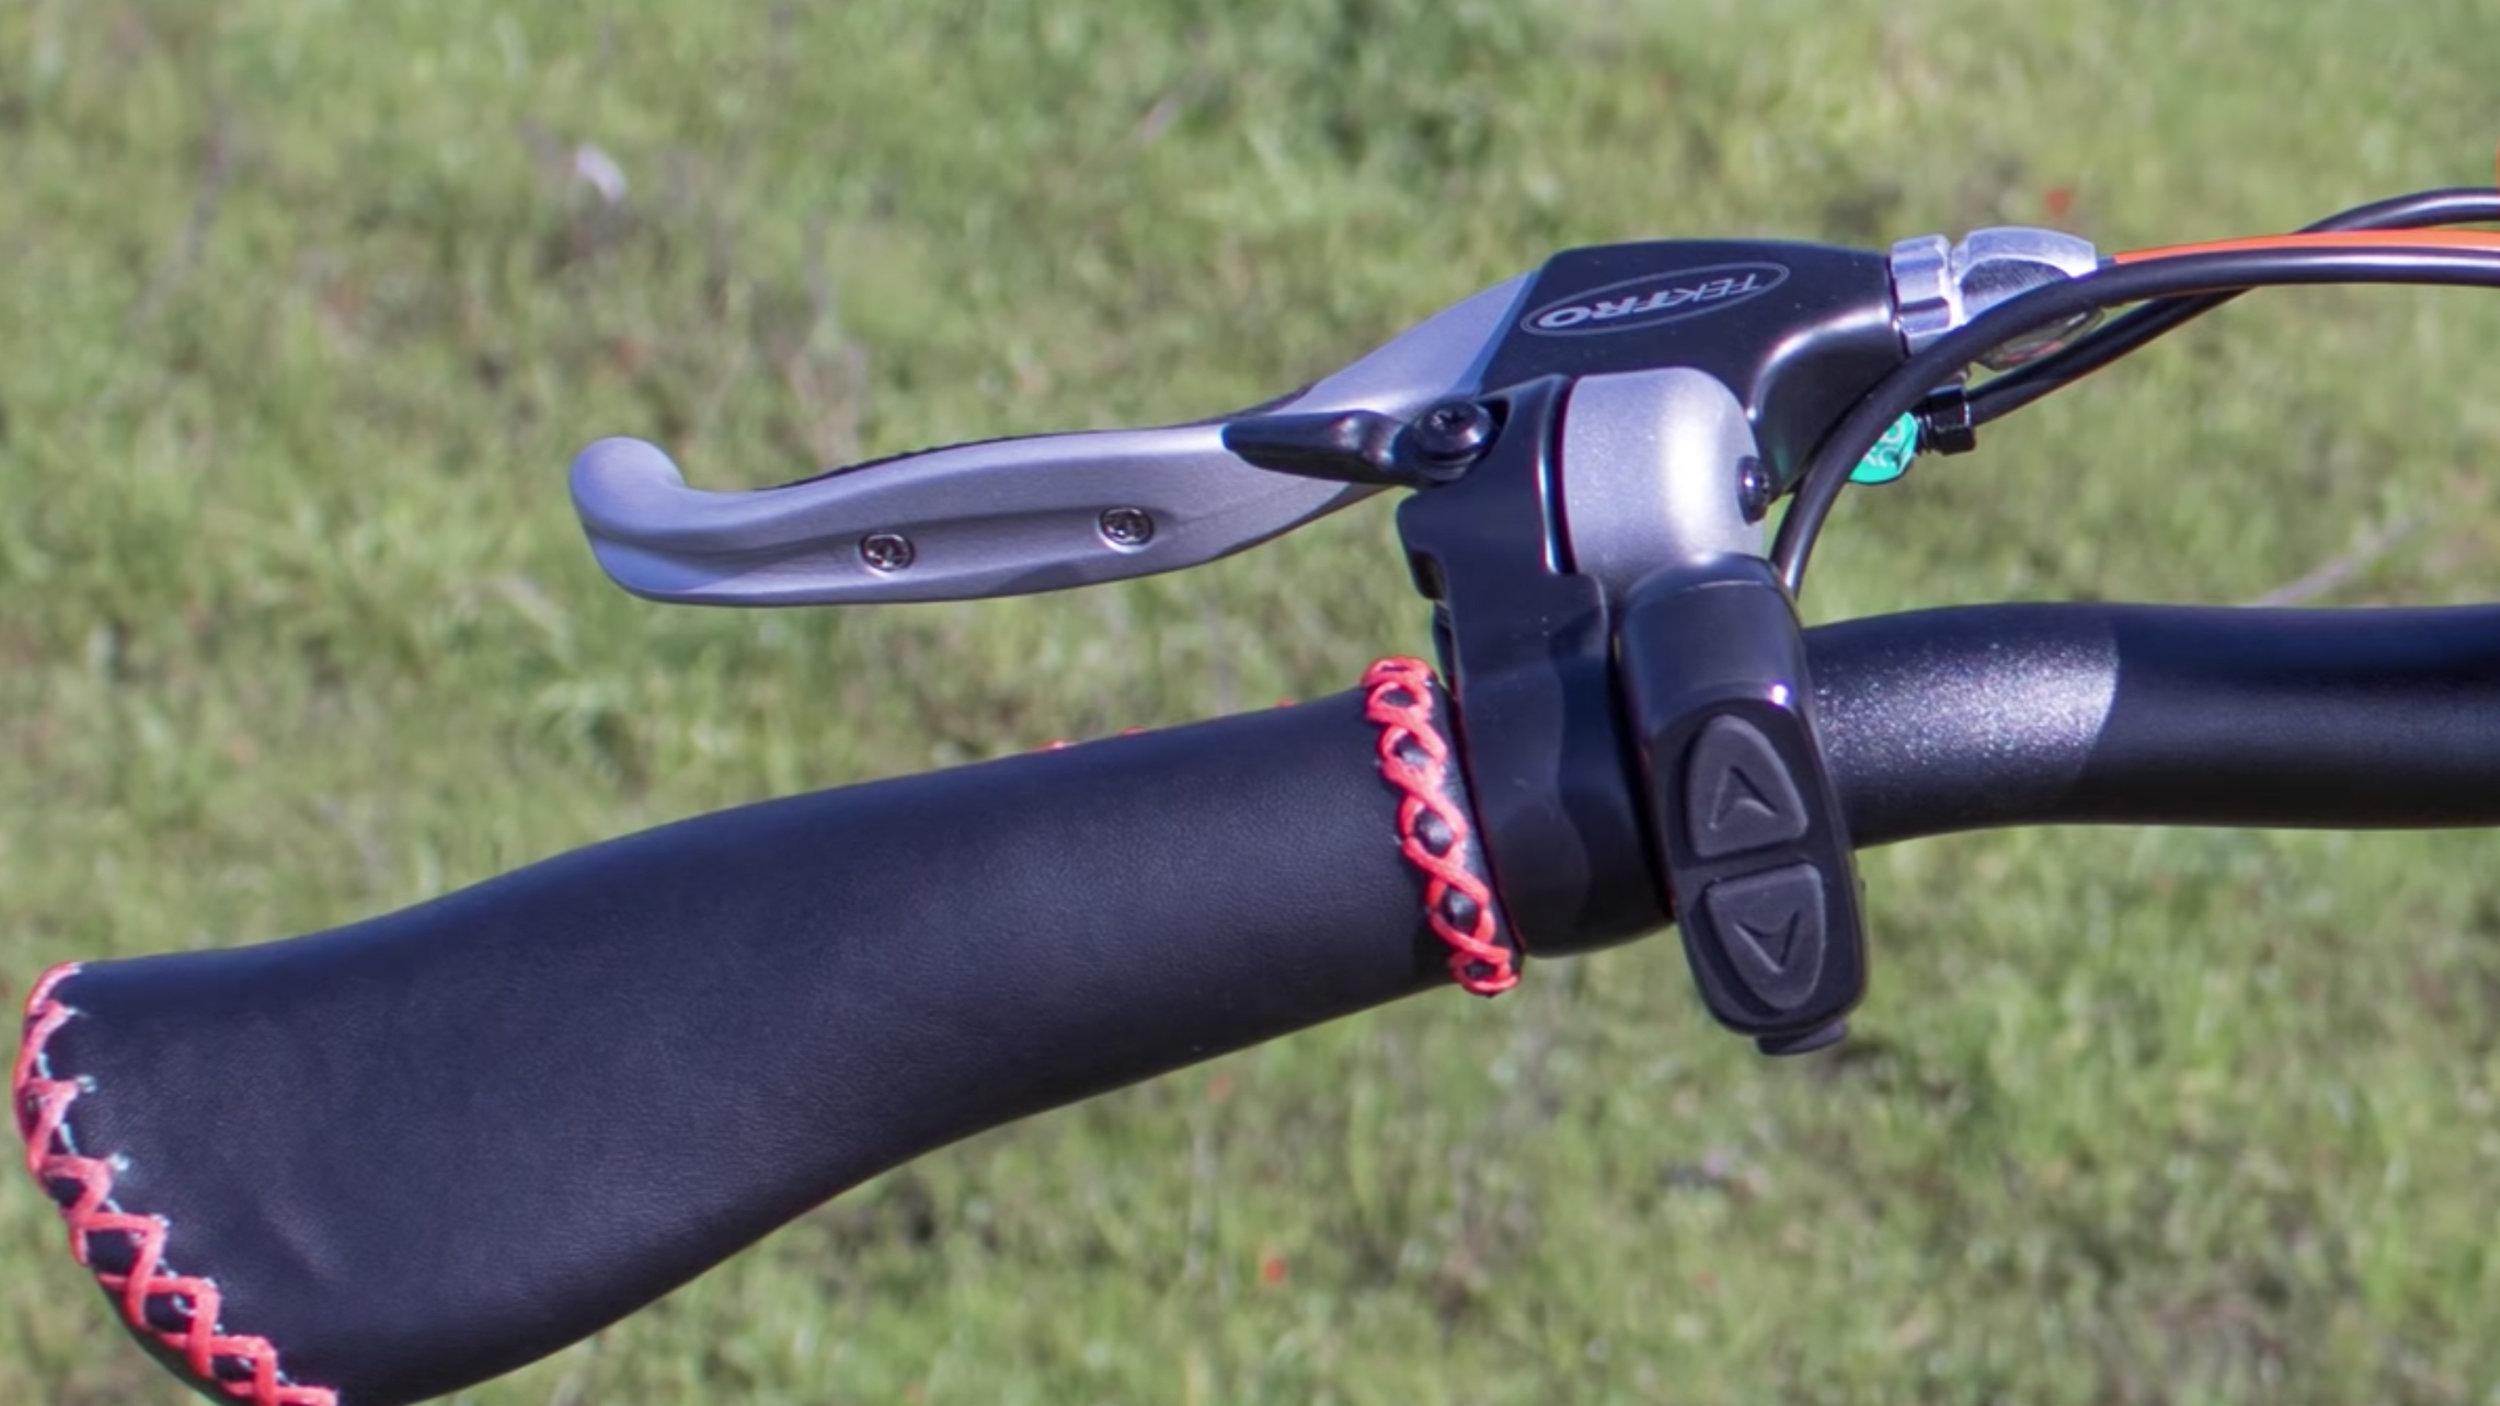 electrified-reviews-addmotor-motan-m150p7-electric-bike-review-grip.jpg